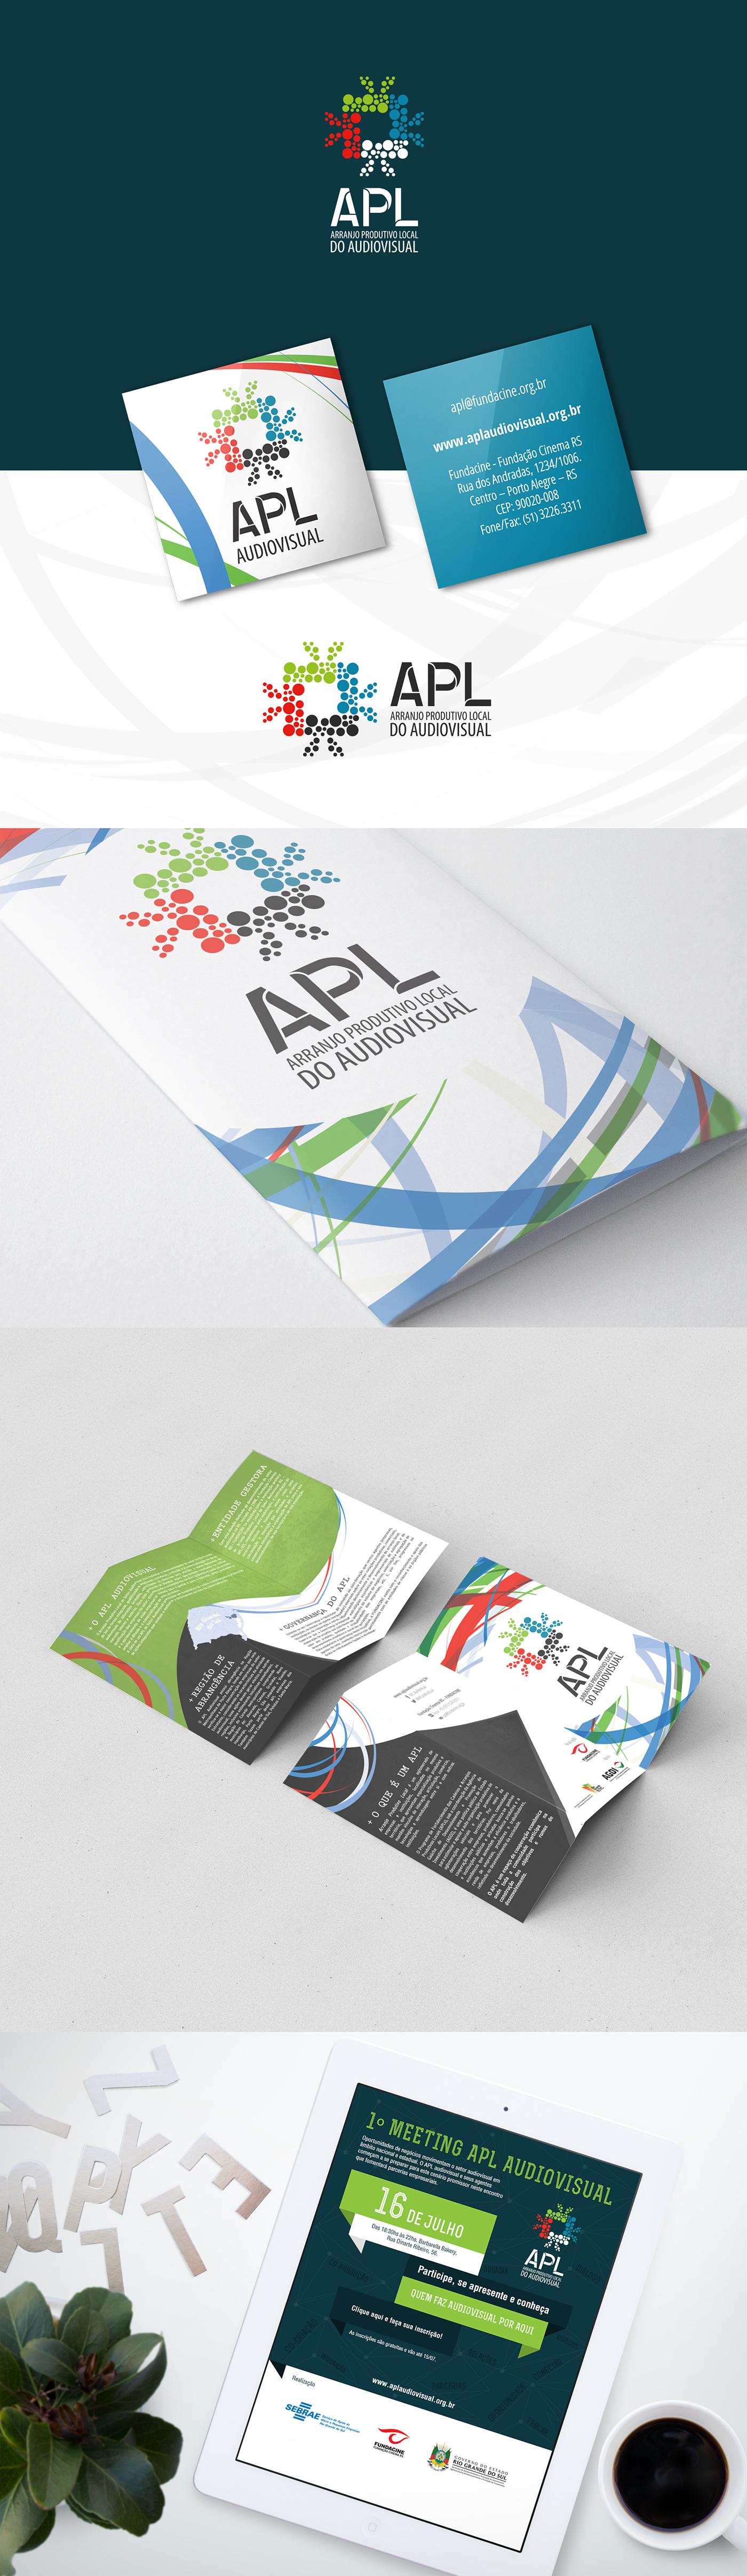 audiovisual projeto APL